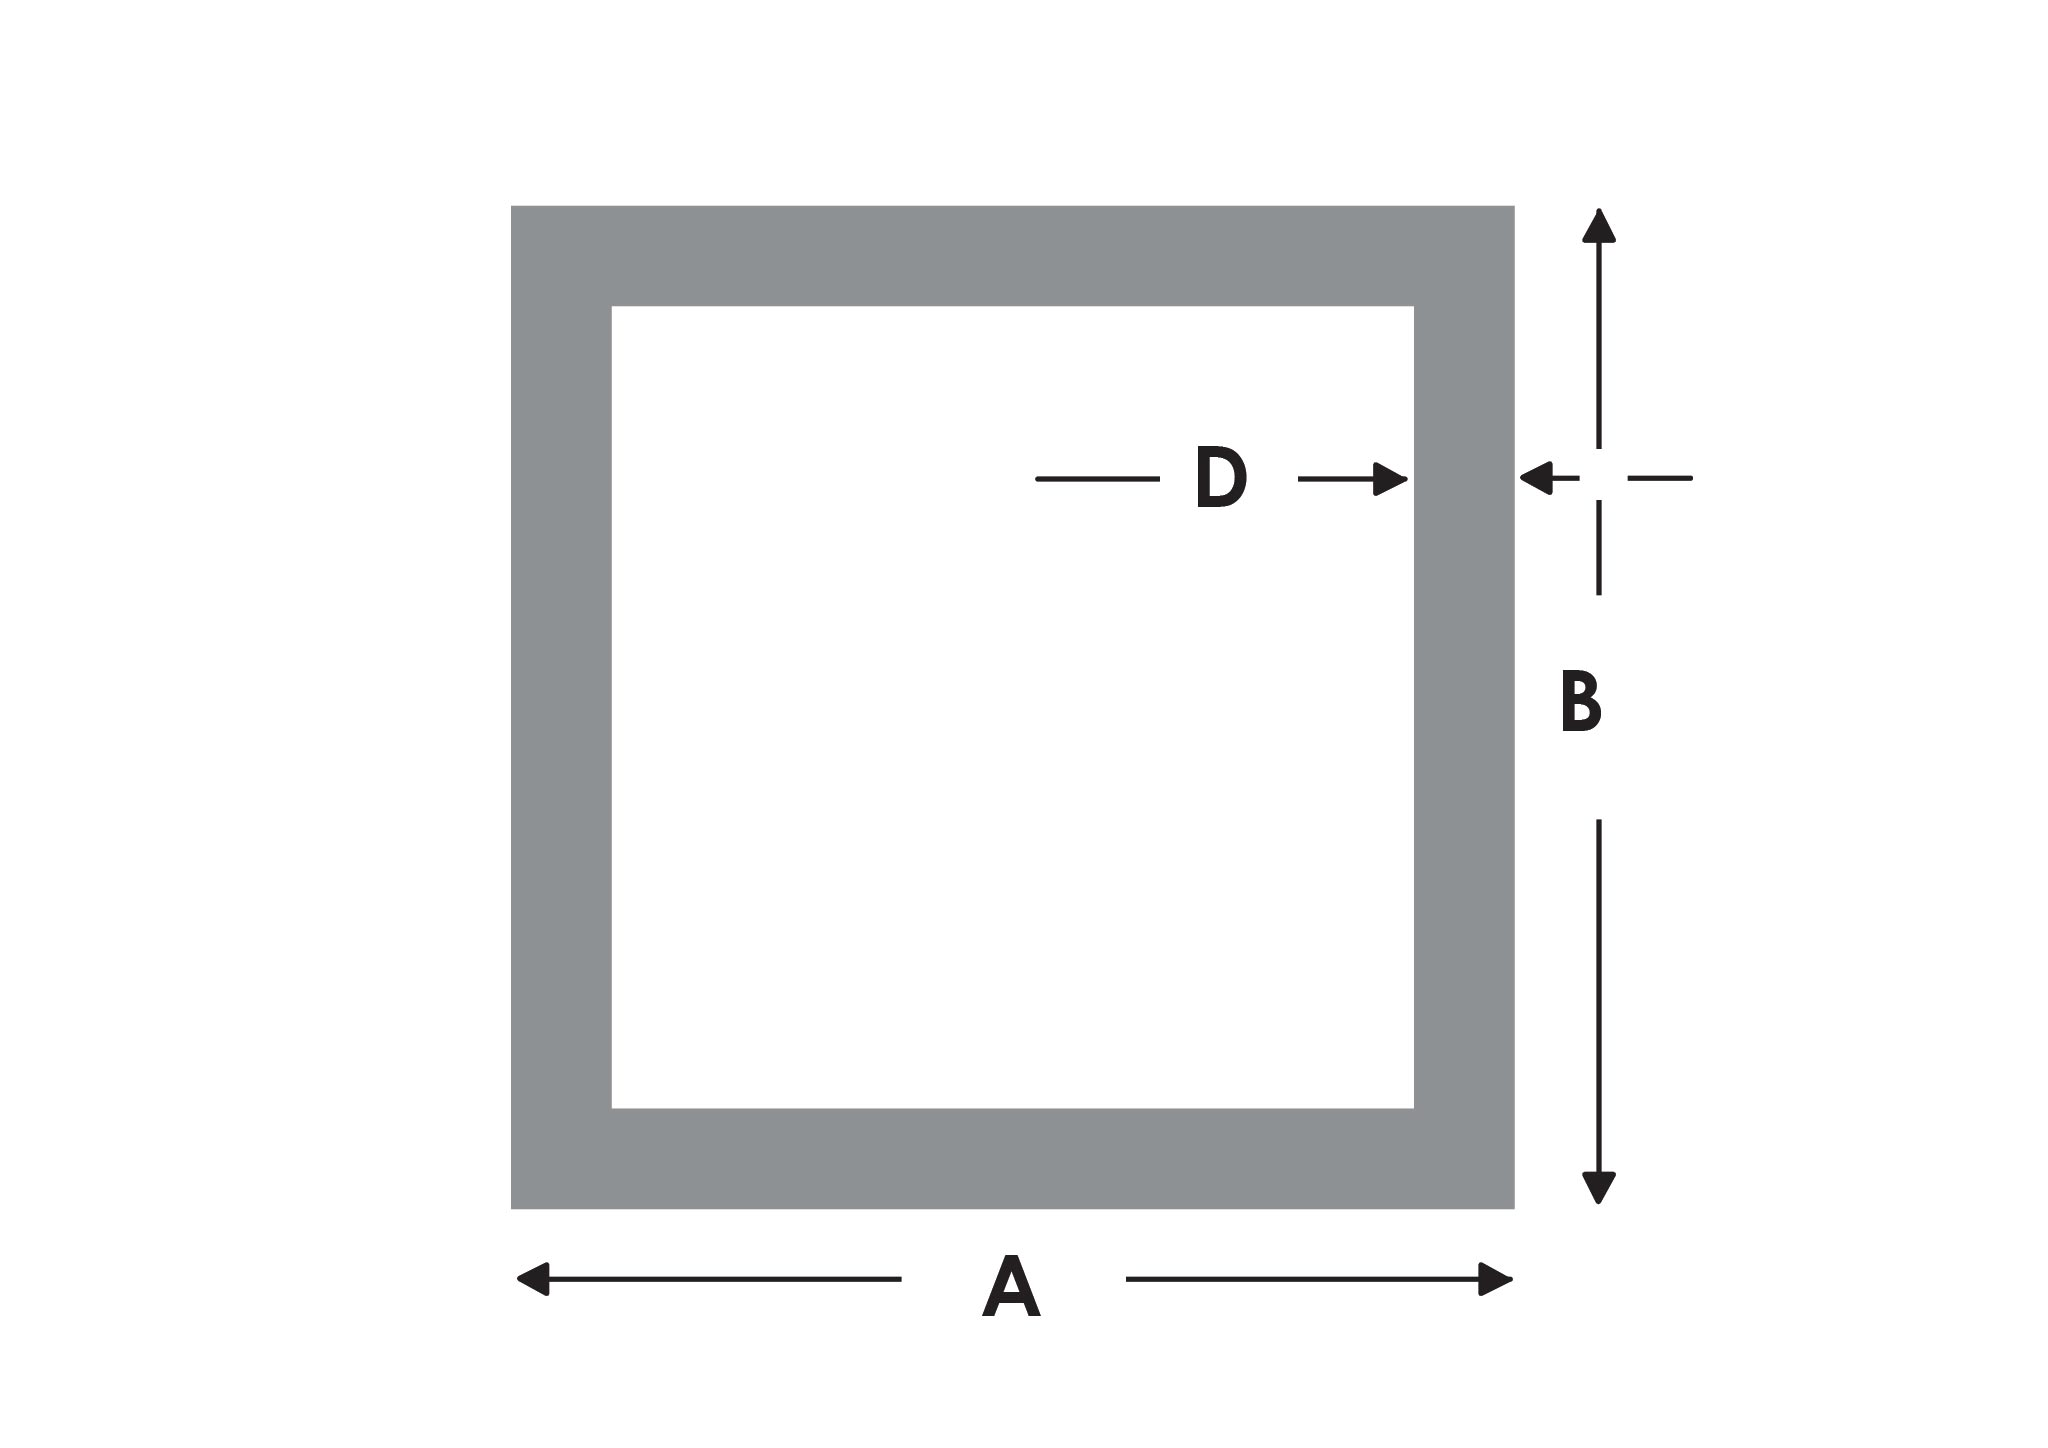 Aluminium Rechteckrohr AW-6060-60x20x2mm auf Zuschnitt 2,5cm L: 25mm